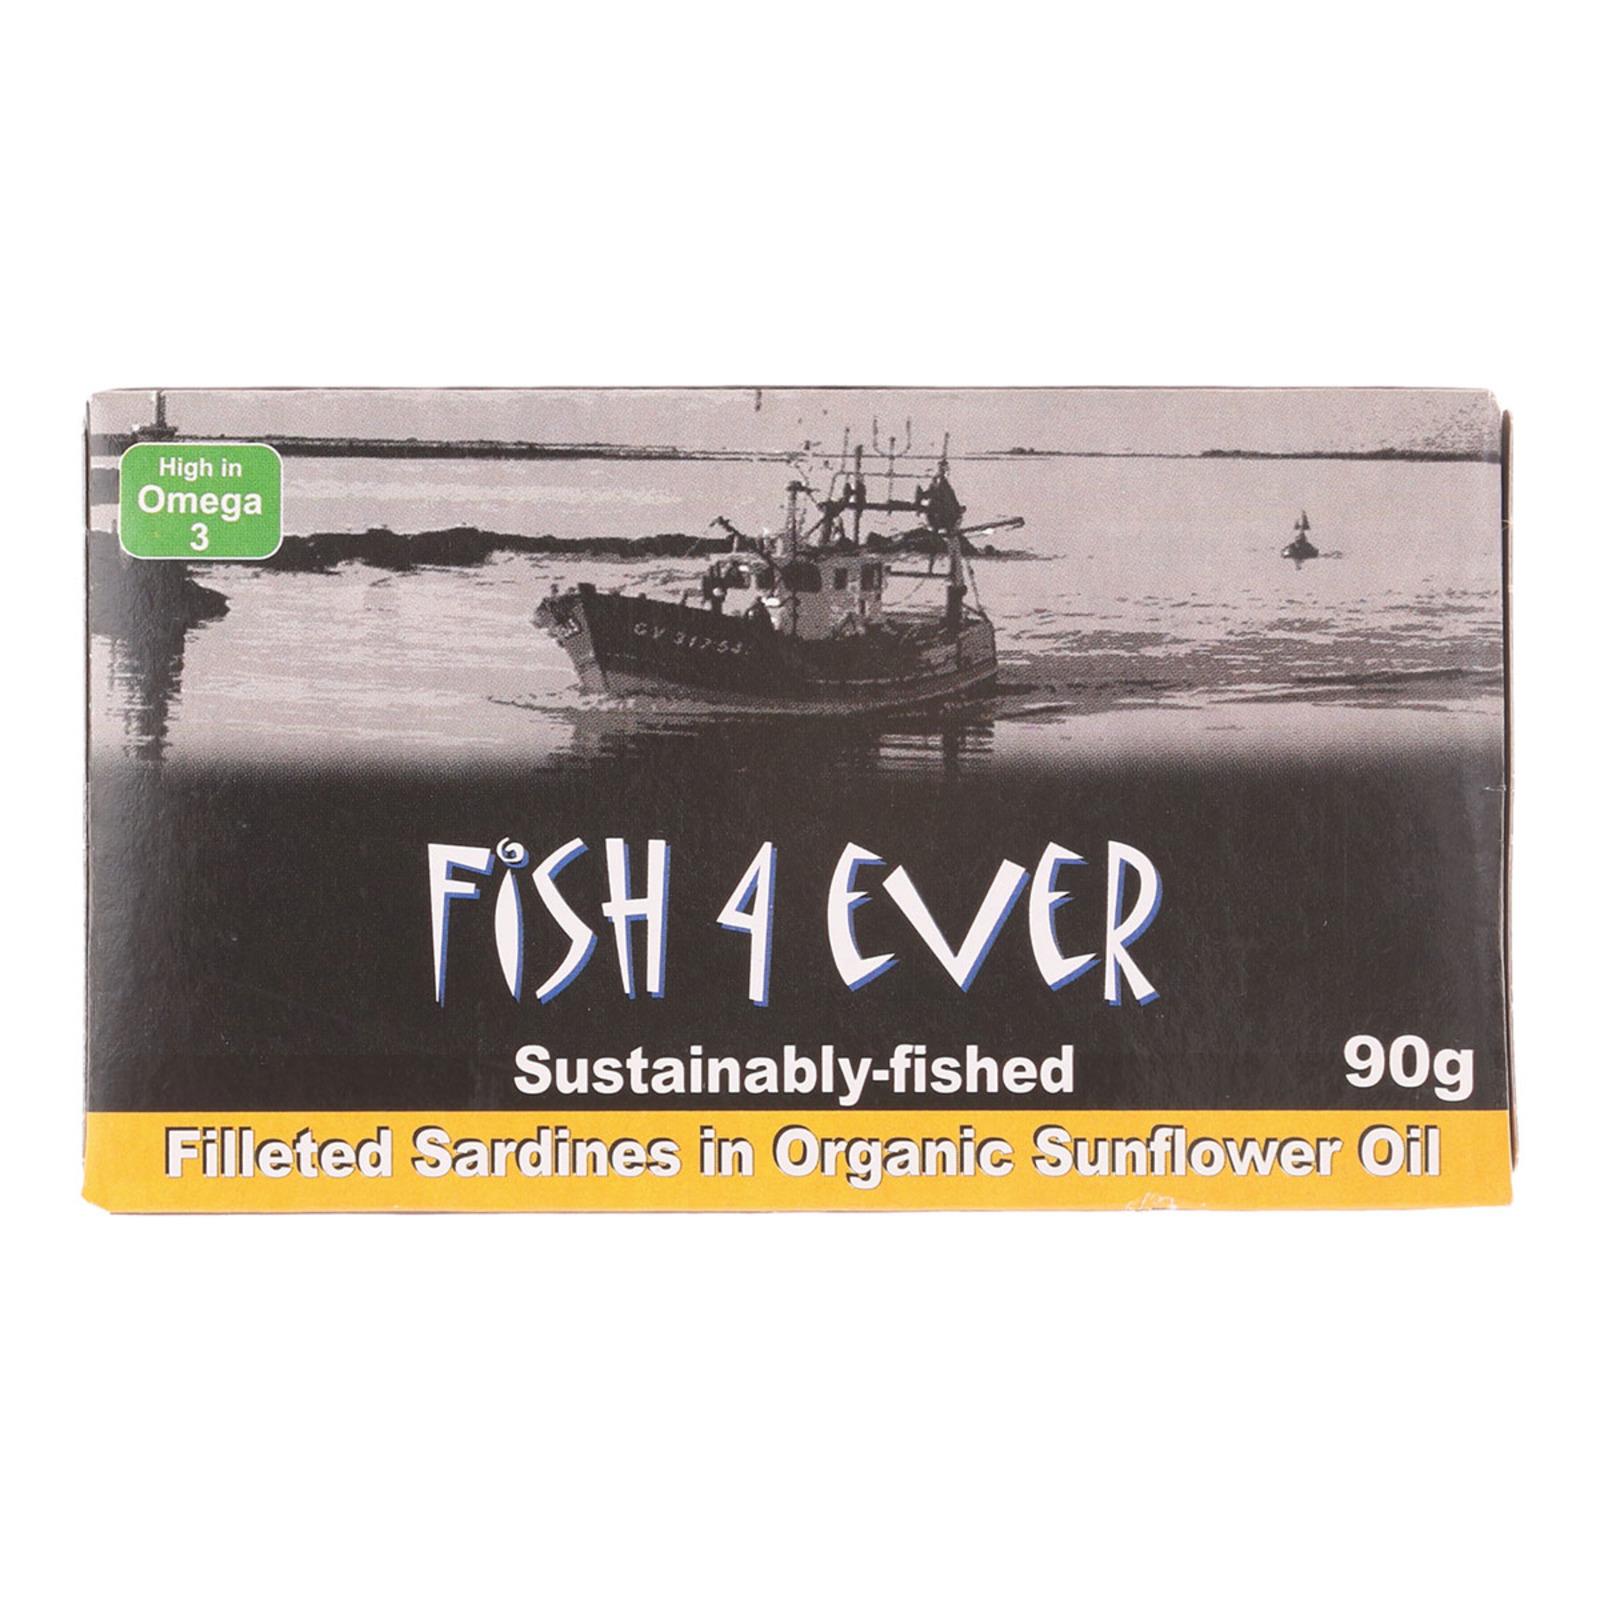 Fish4ever Sardine Fillets In Organic Sunflower Oil